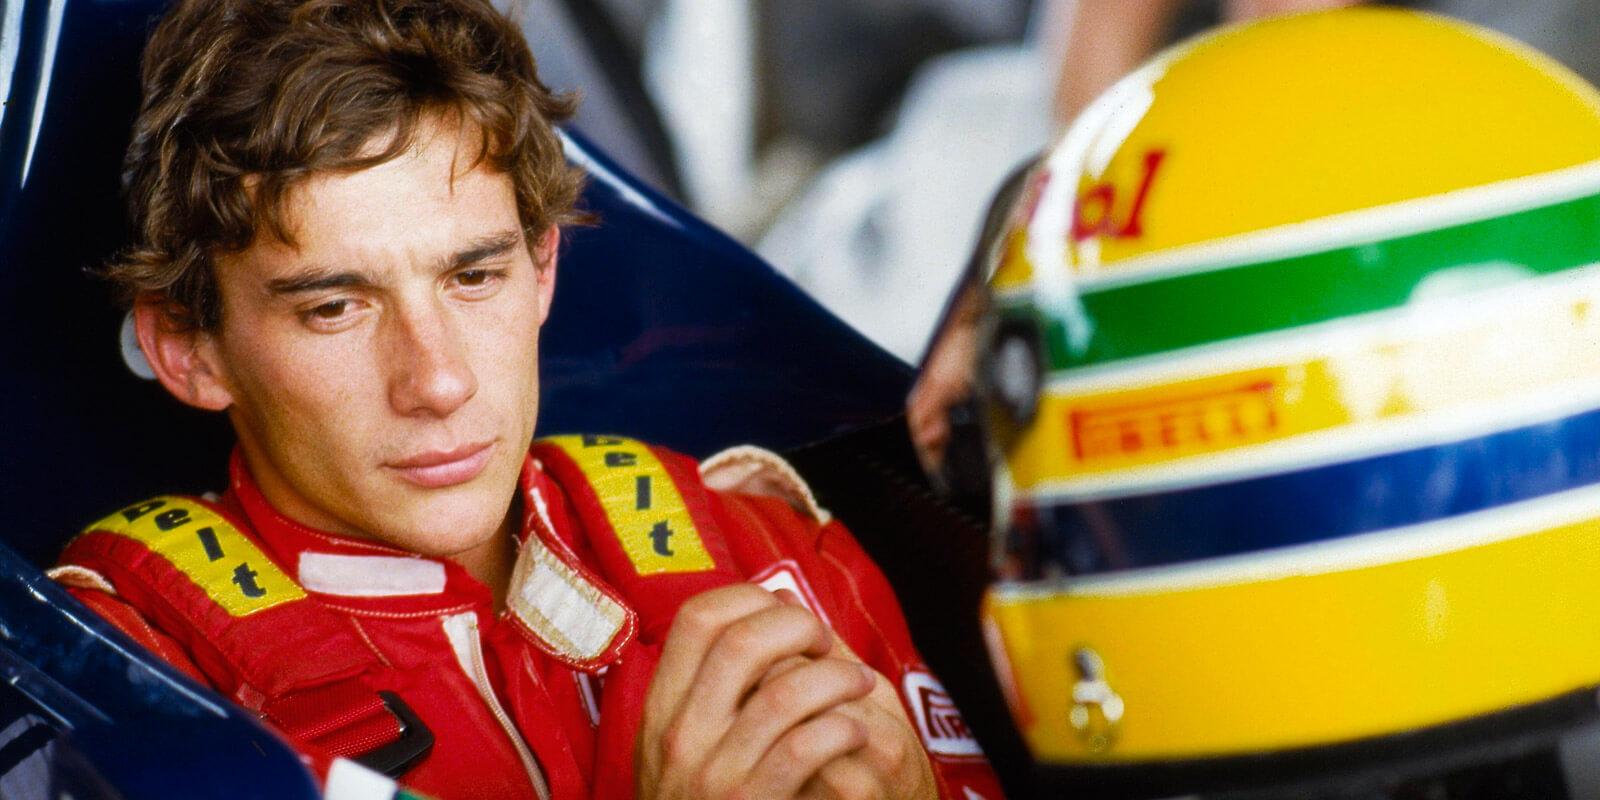 Aniversario Ayrton Senna